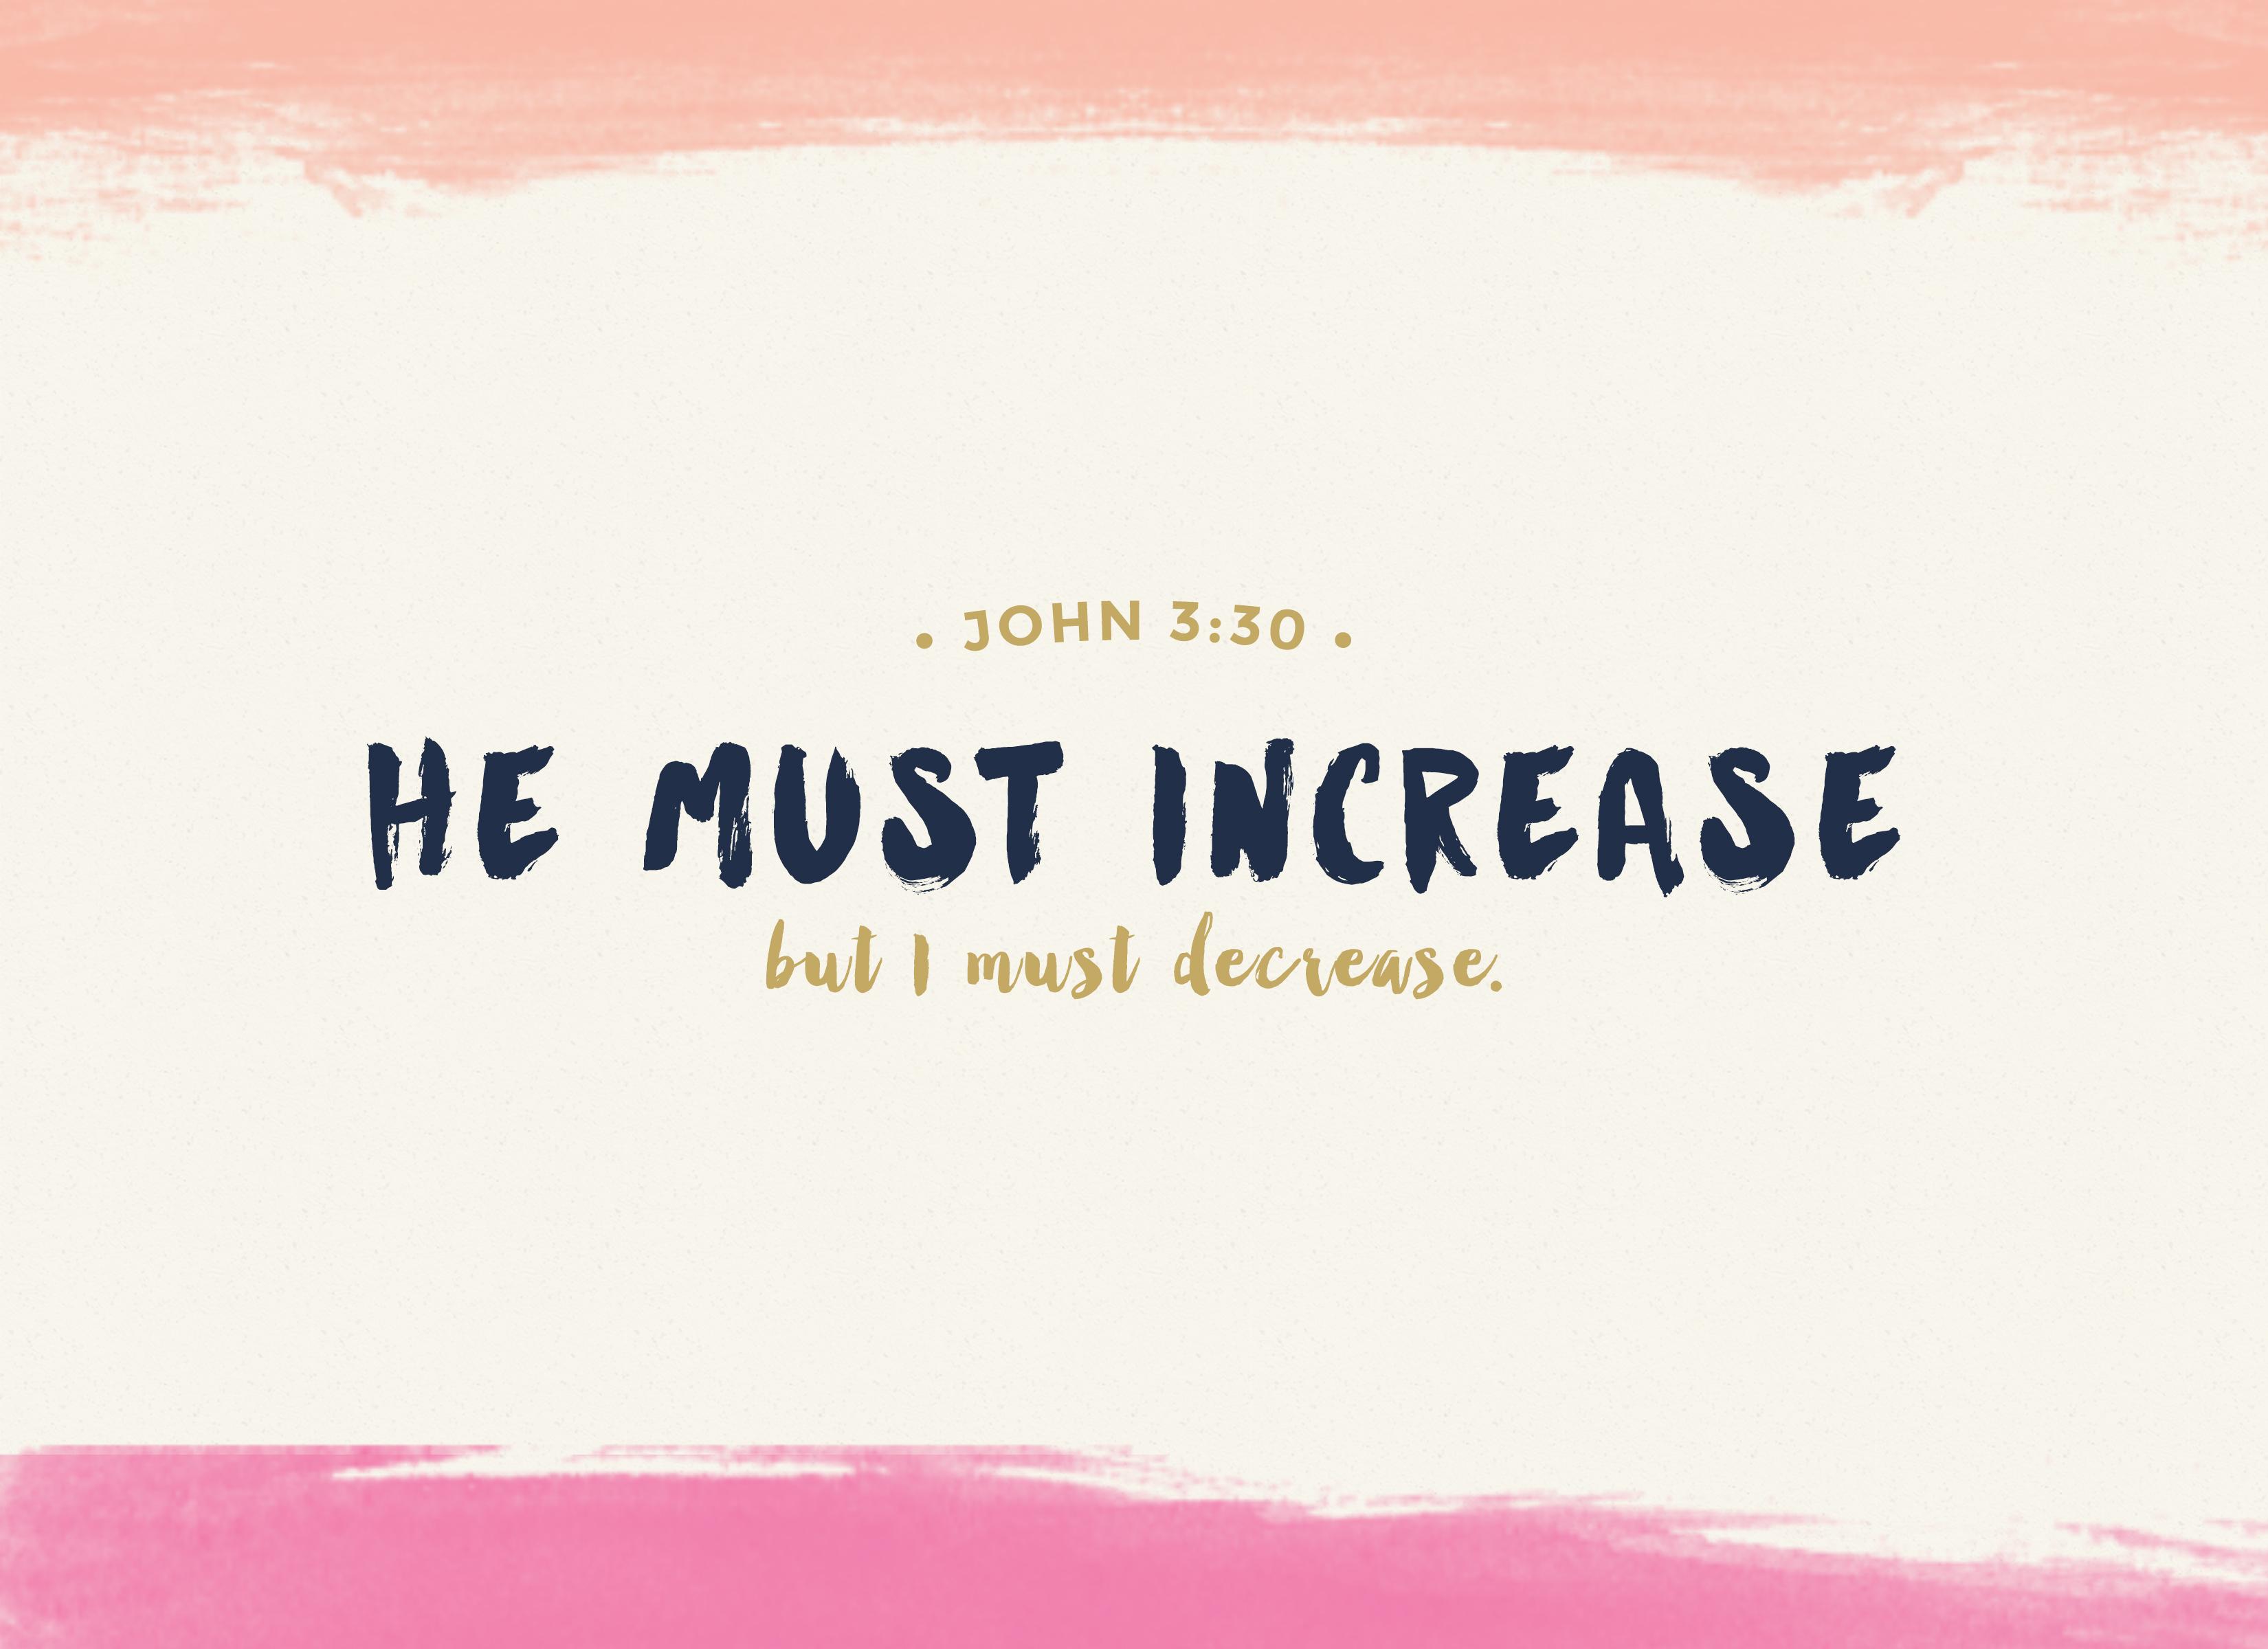 John 3-30 Printable